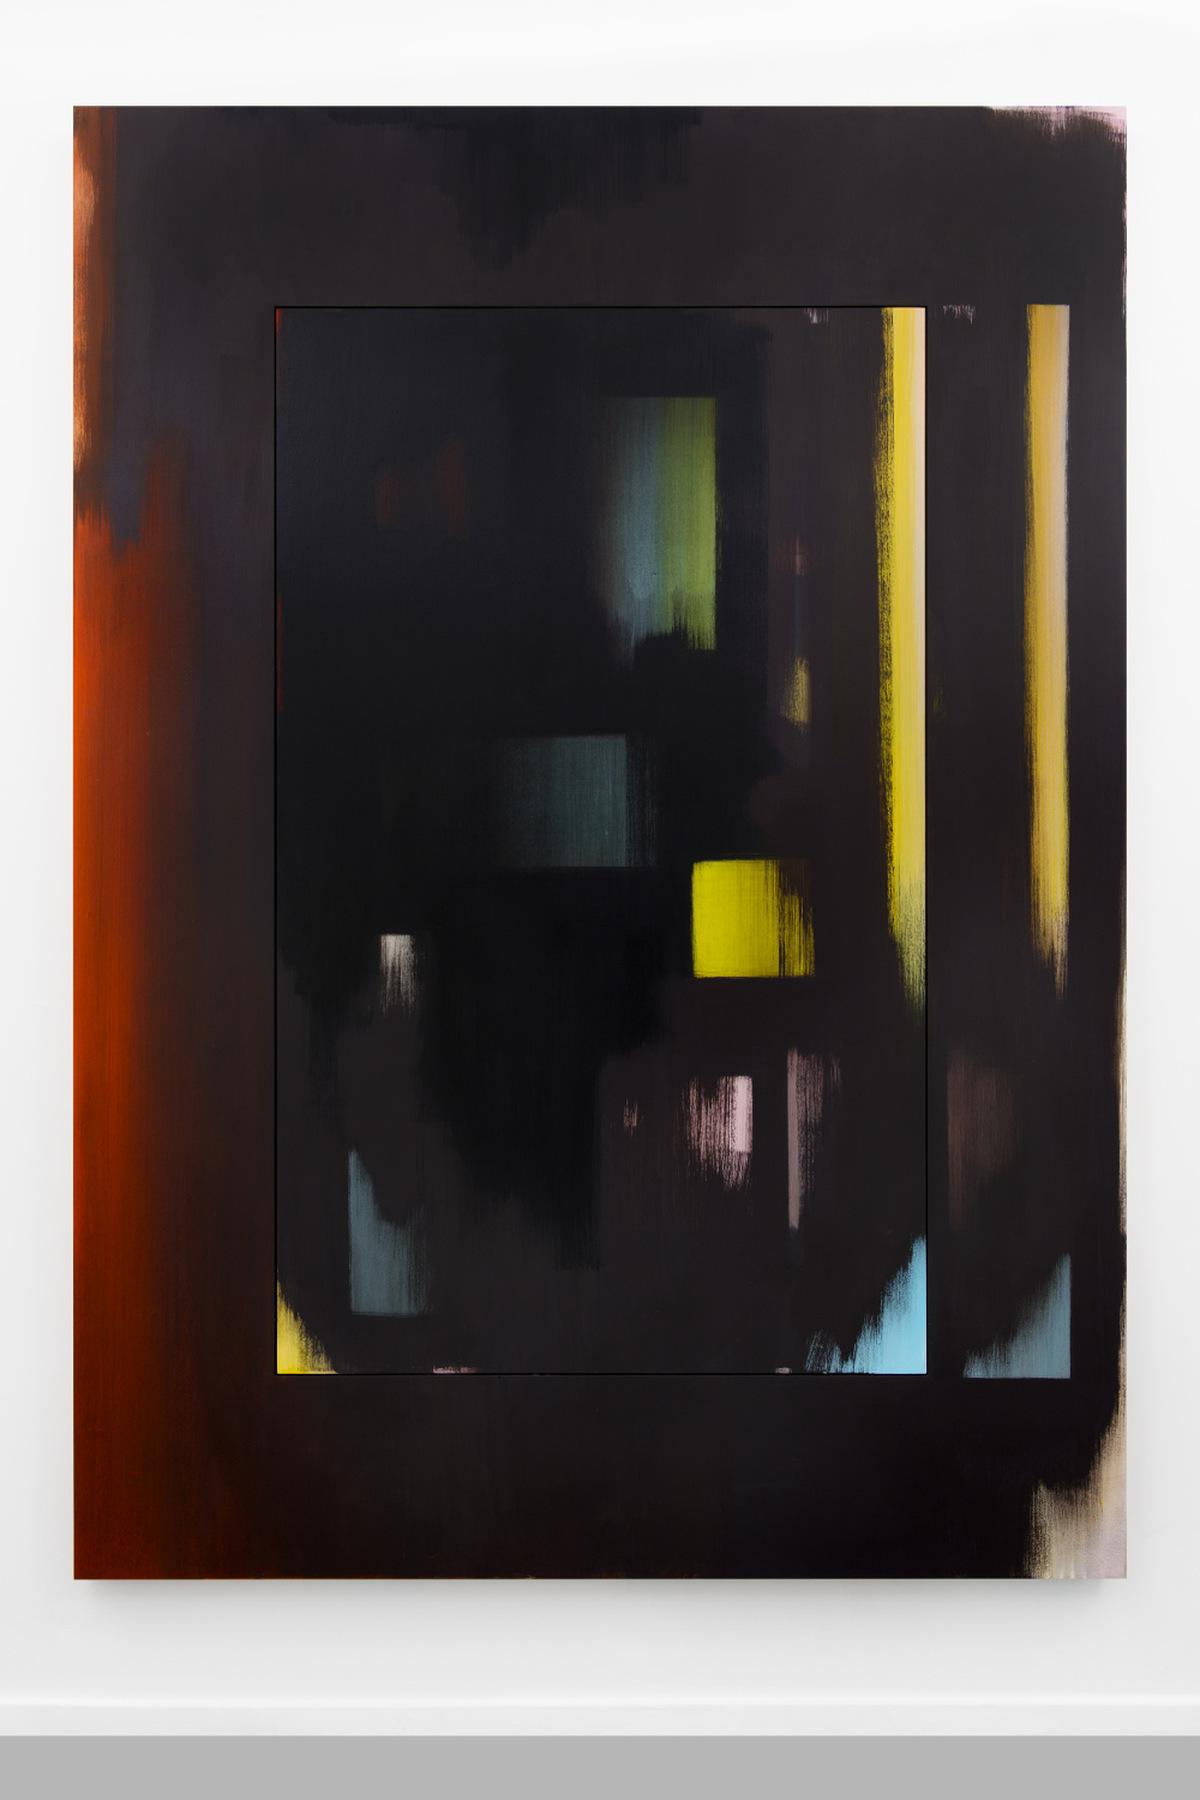 3-Esther-Tielemans-Untitled-2016-Acrylic on panel-210x150cm-image-courtesy-CINNNAMON-Rotterdam